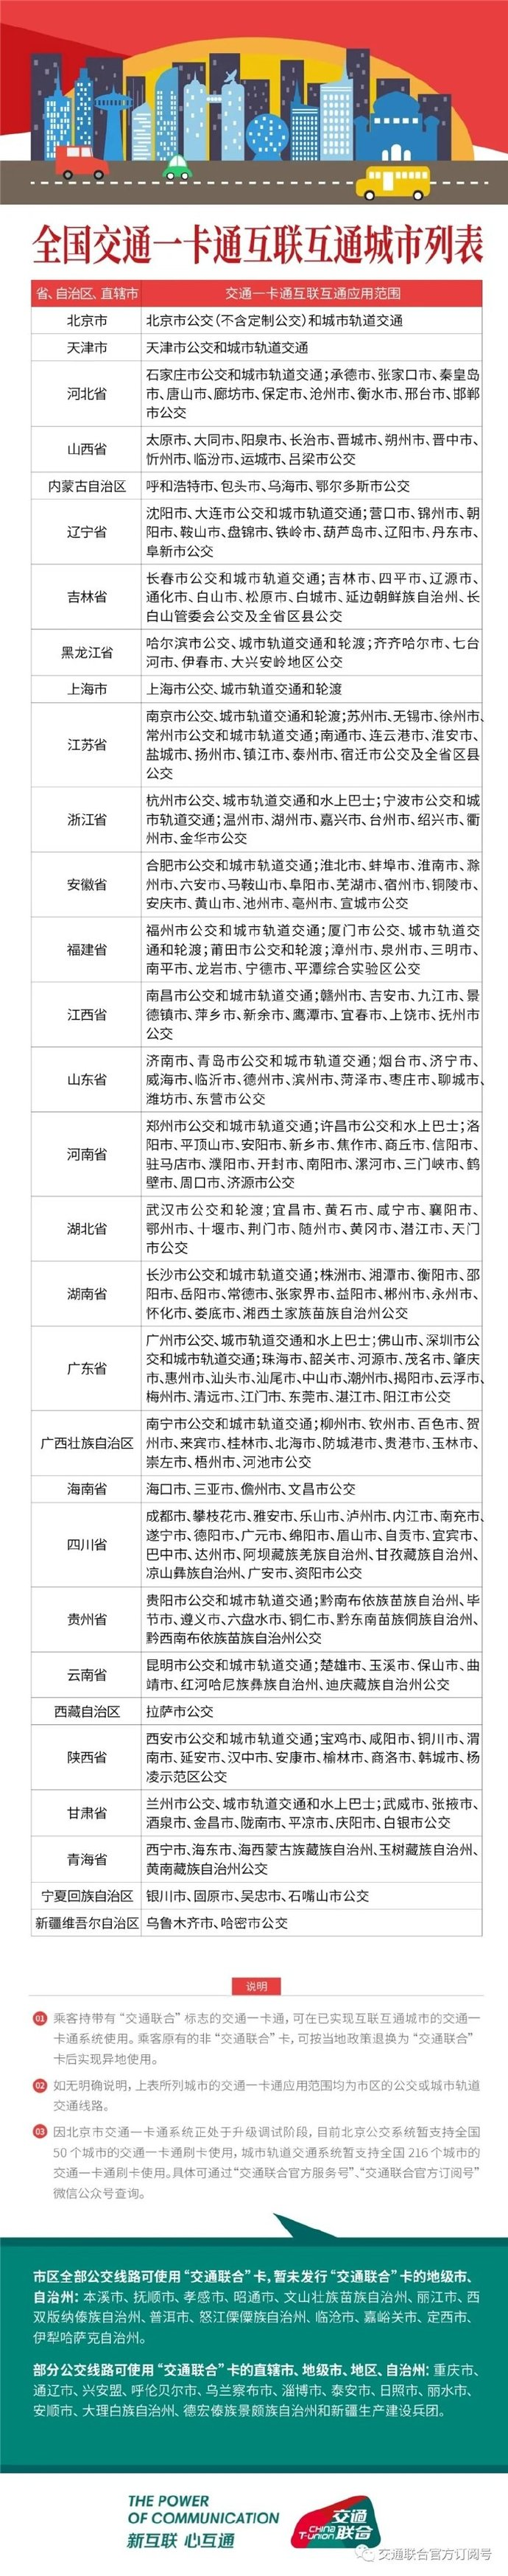 Apple Pay 「江苏交通一卡通 · 苏州」正式上线